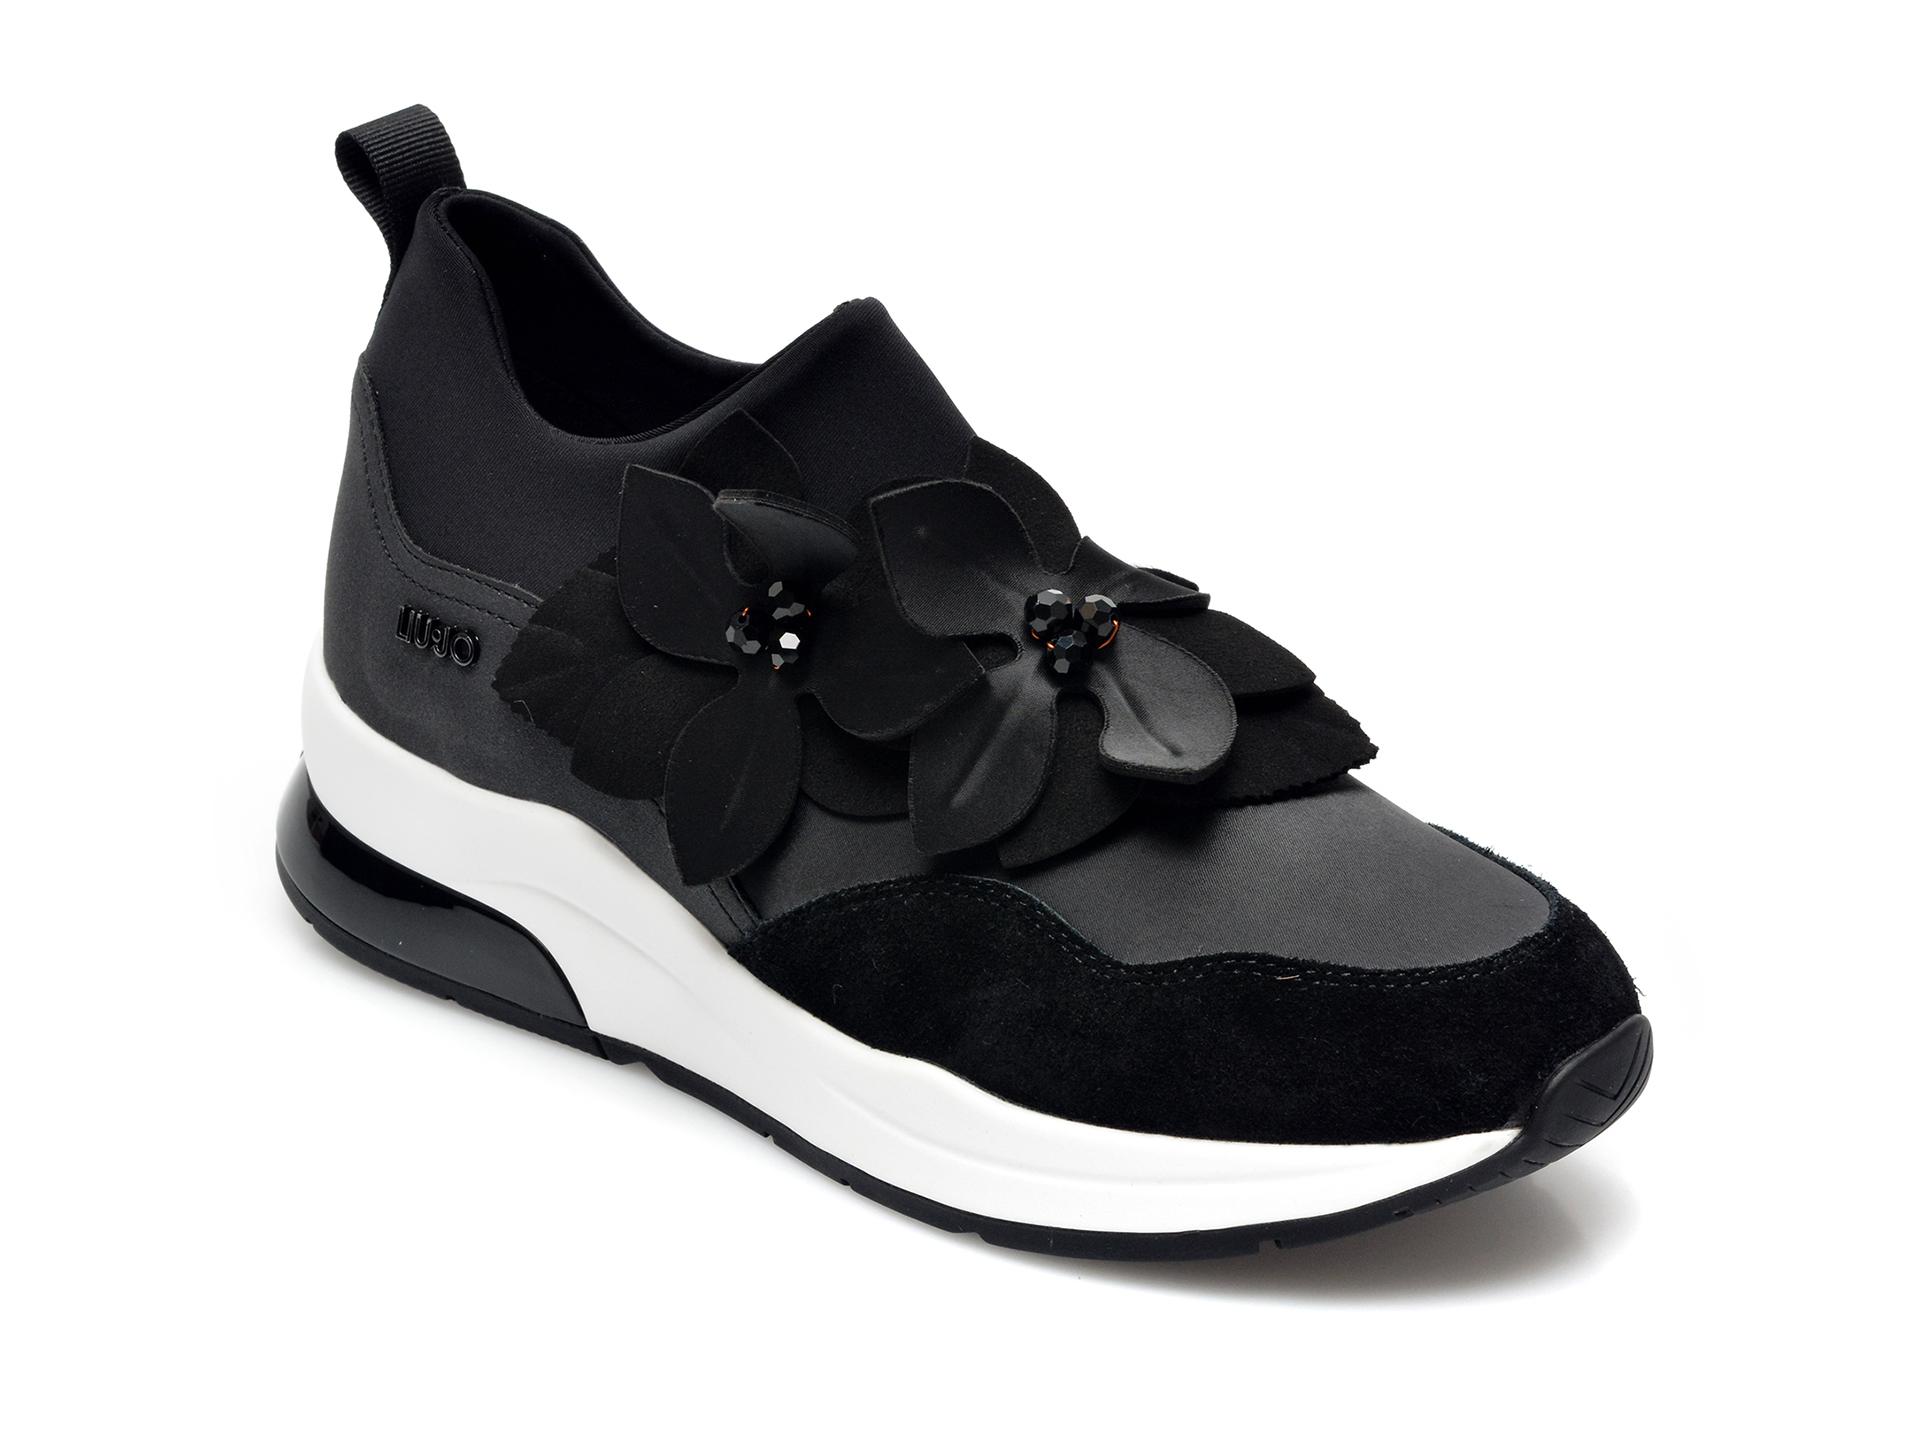 Pantofi sport LIU JO negri, Karlie 53, din material textil si piele intoarsa